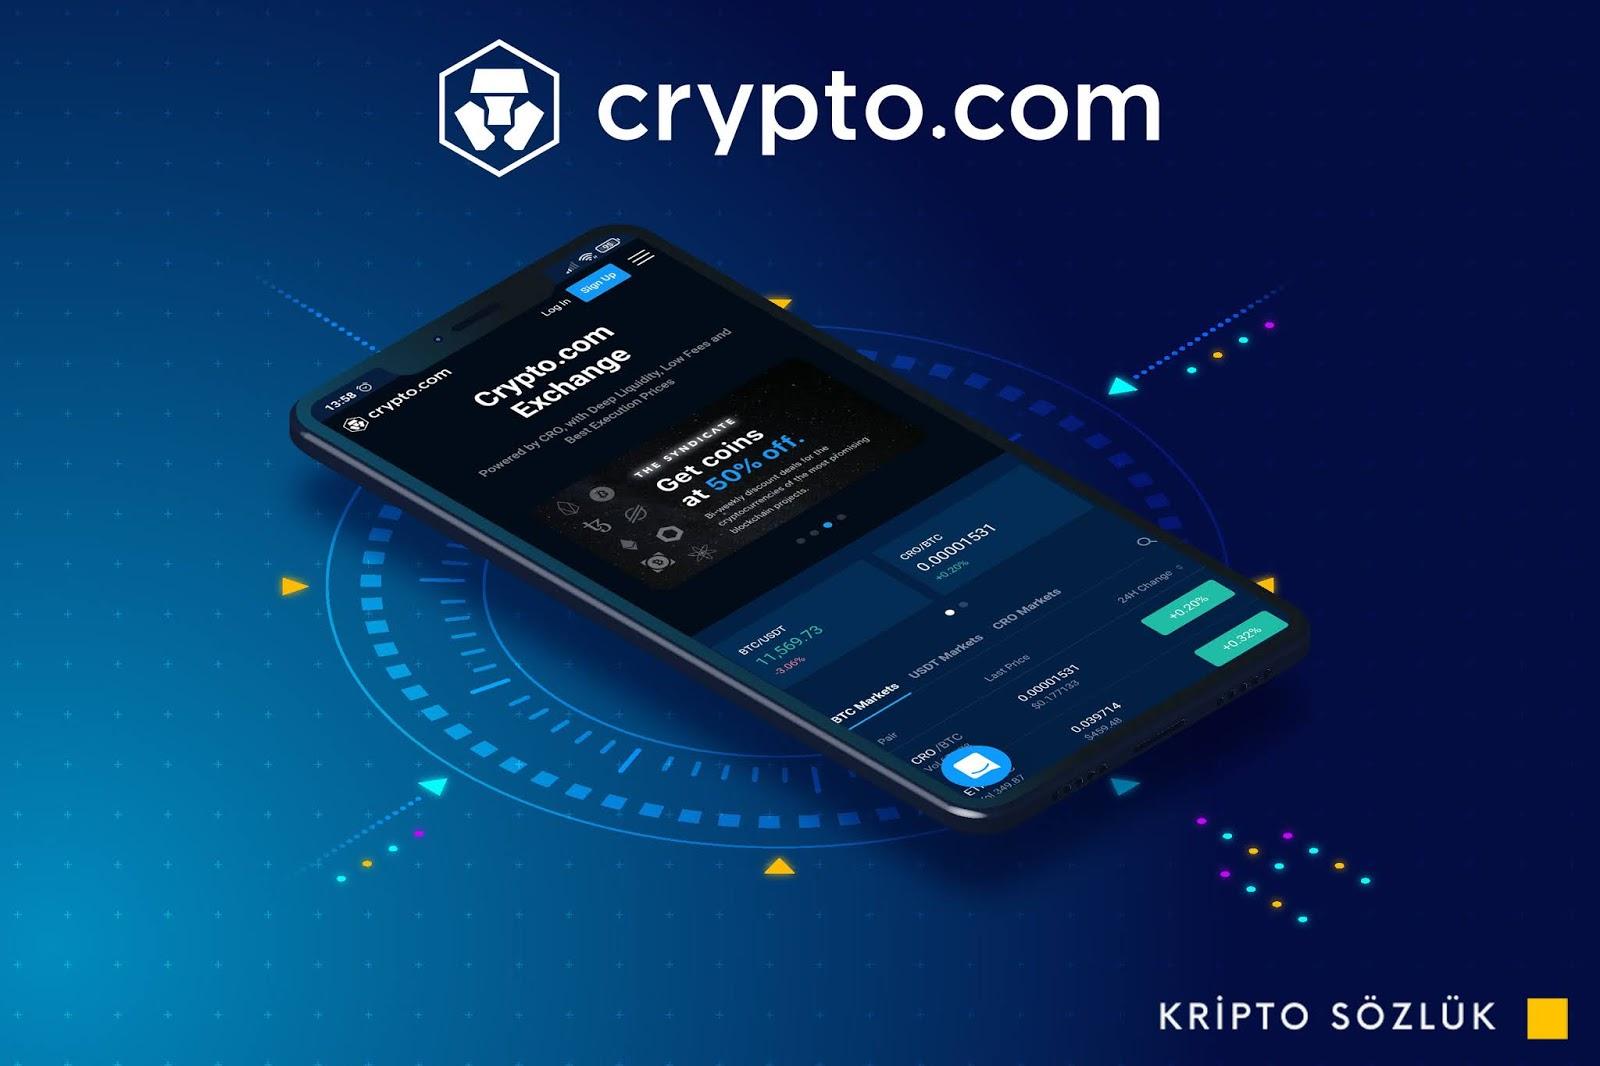 Crypto.com Referans İle 2.000 Dolara Kadar Kazanın